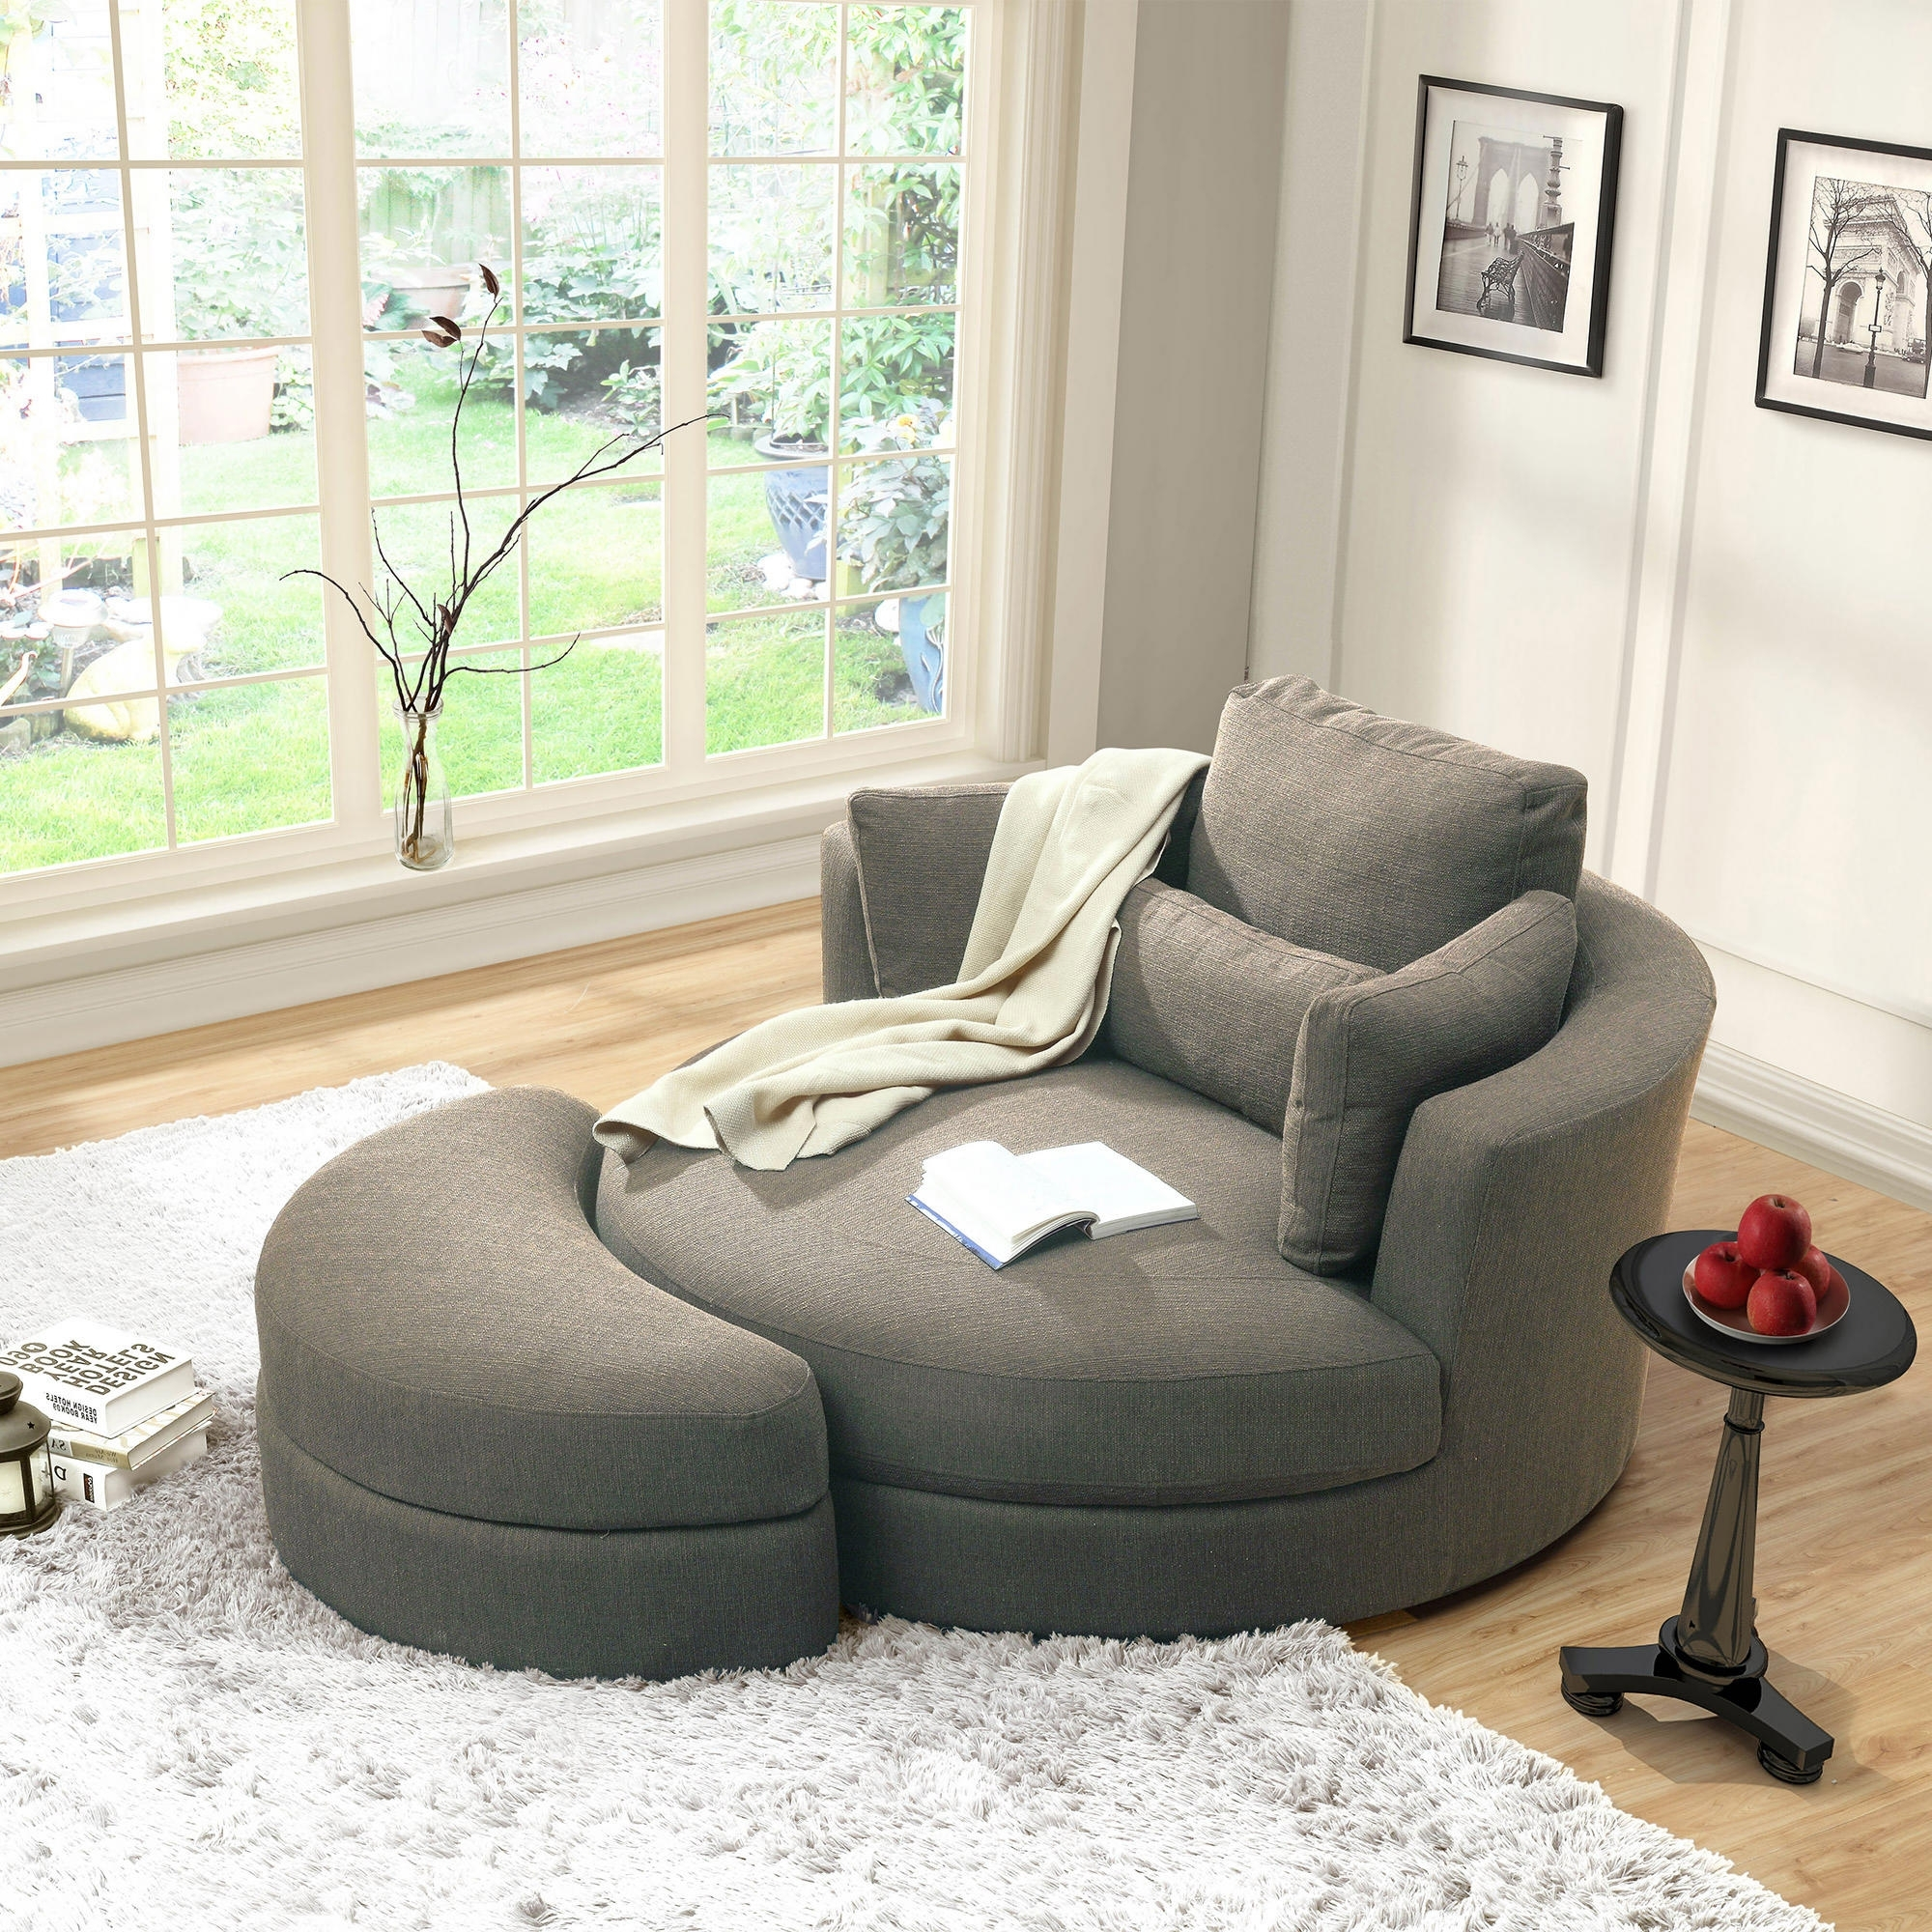 Latest Turner Grey Cuddler Swivel Chair With Storage Ottoman (View 8 of 15)